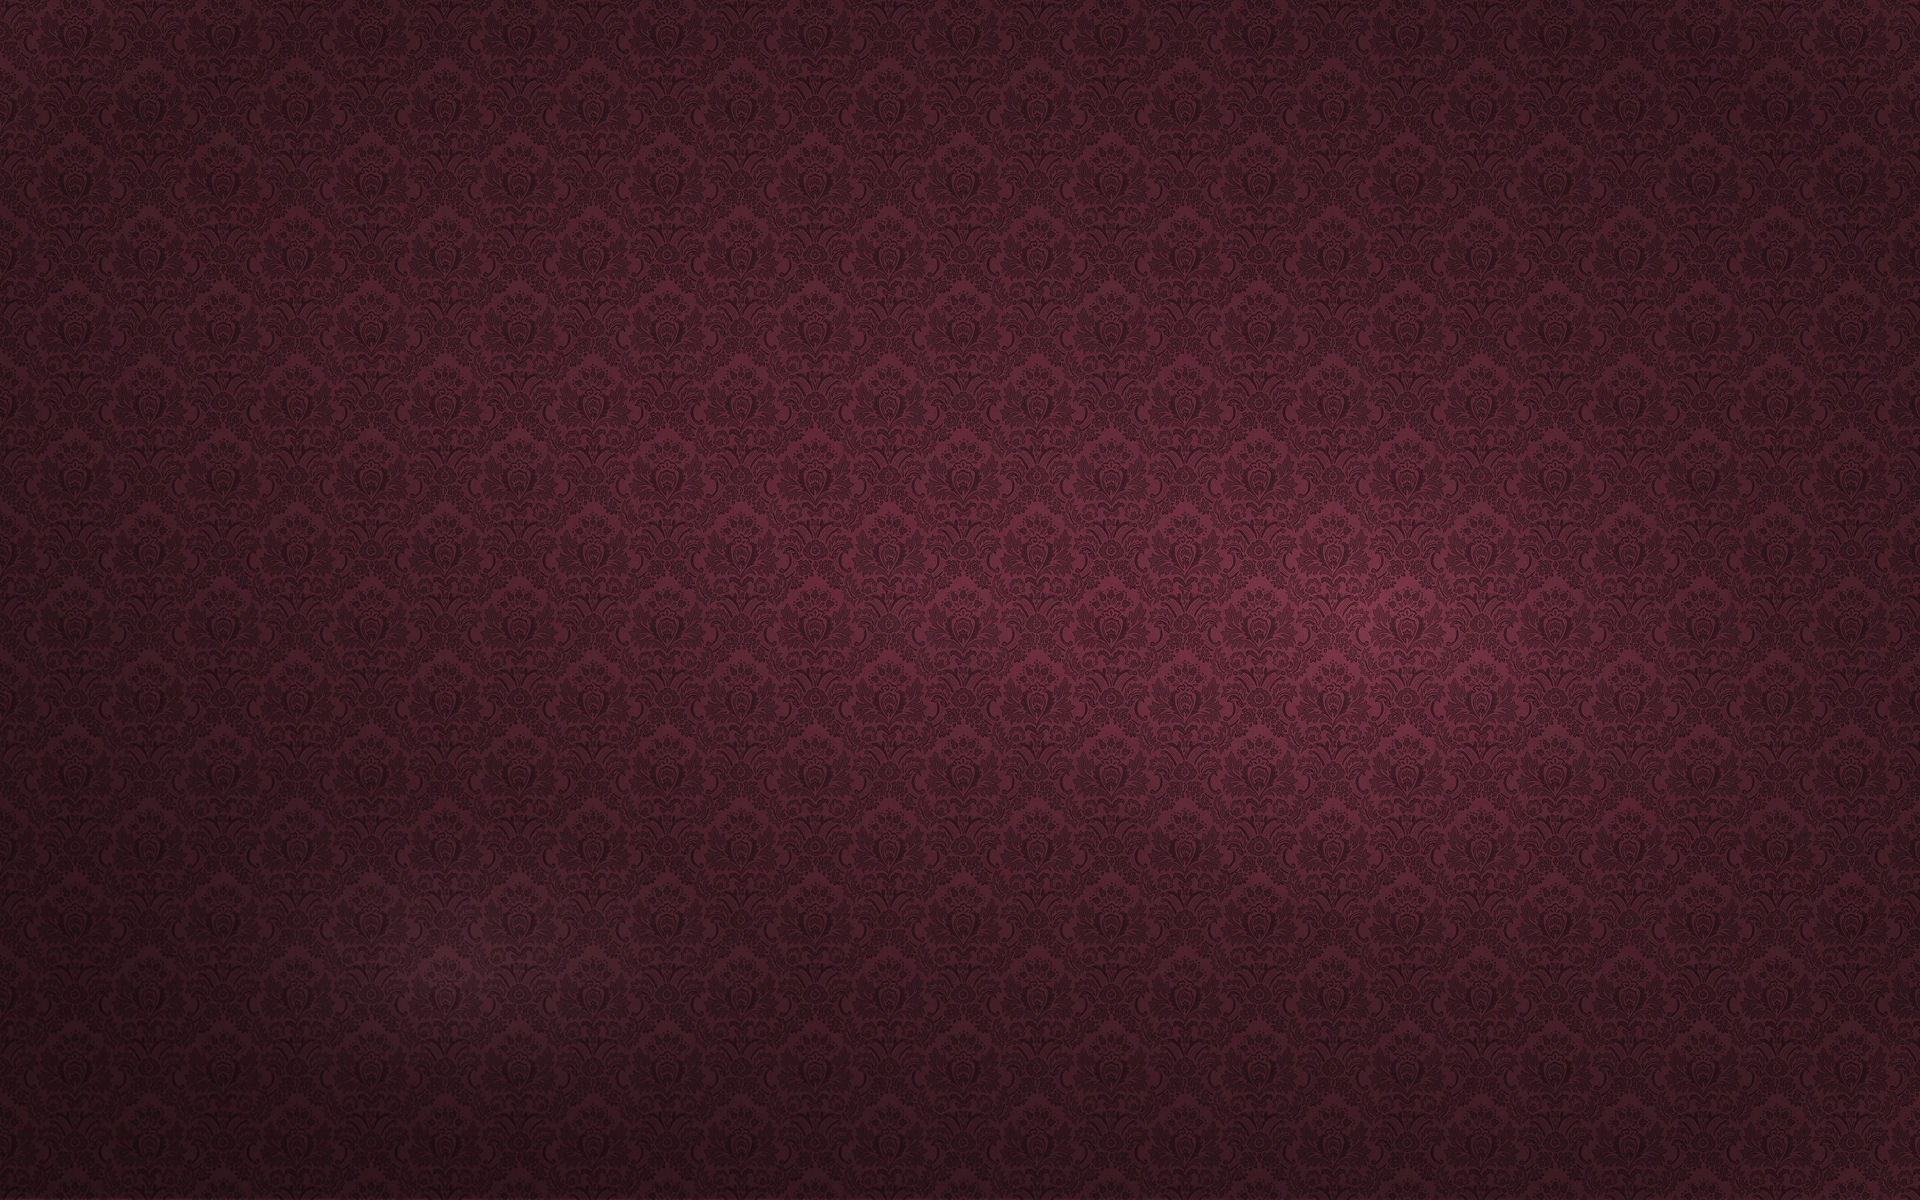 Bordeaux Floral Texture Hd Wallpaper Wallpaper List 1920x1200